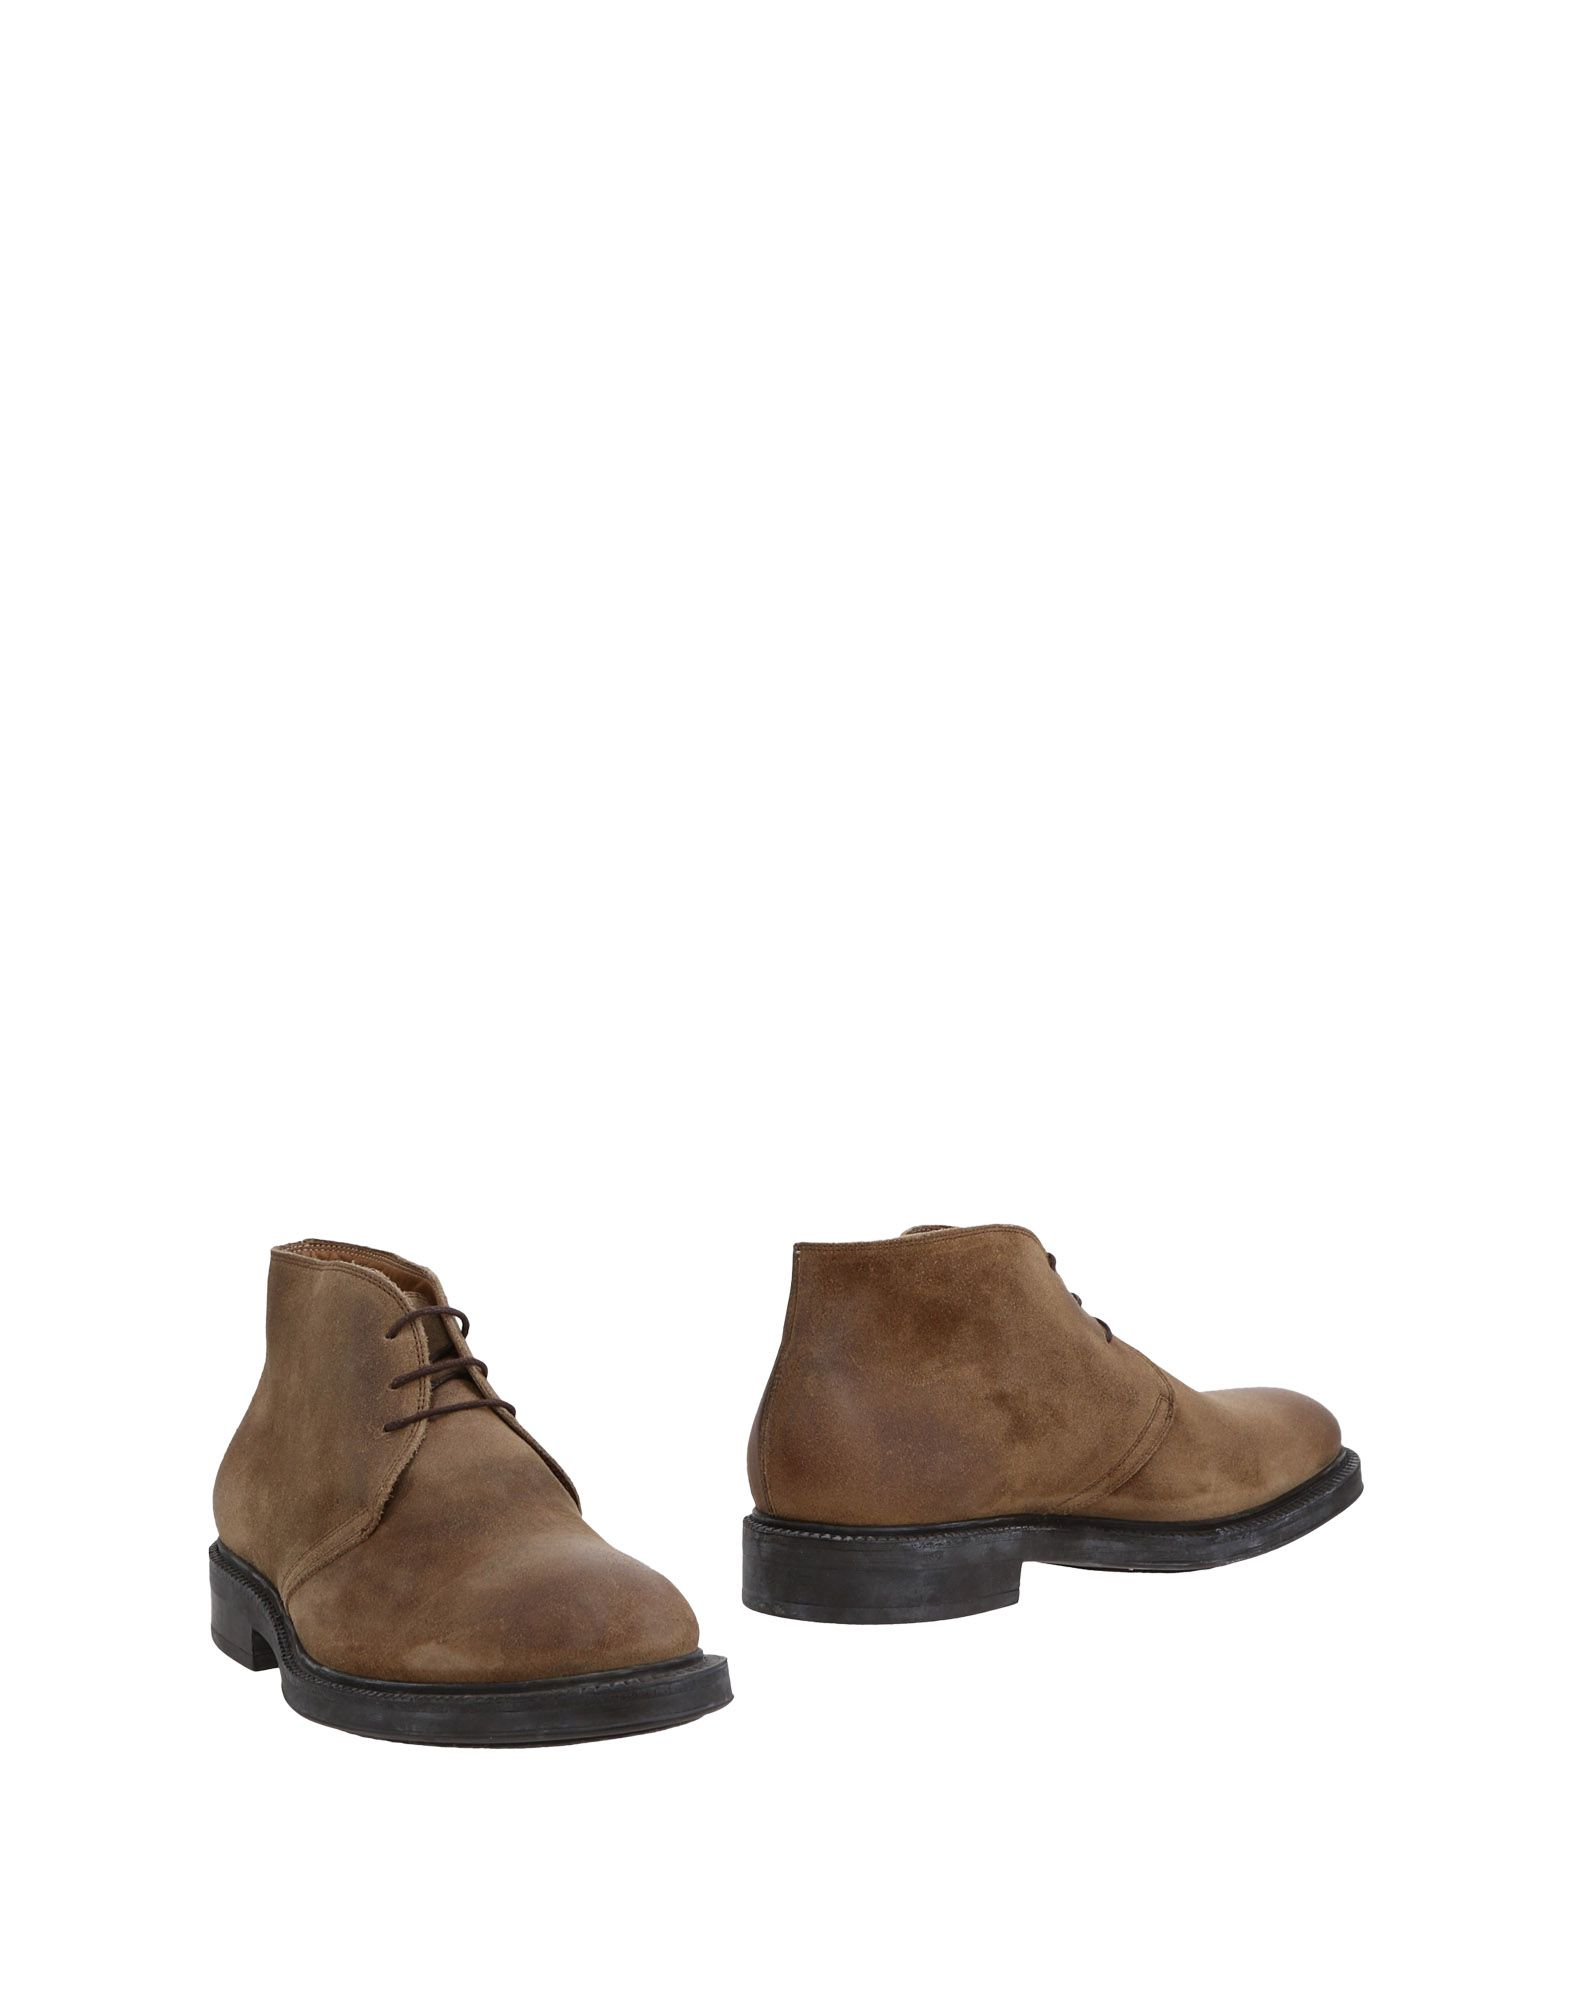 FRAU Полусапоги и высокие ботинки vitaly mushkin reife frau unbeabsichtigte versuchung